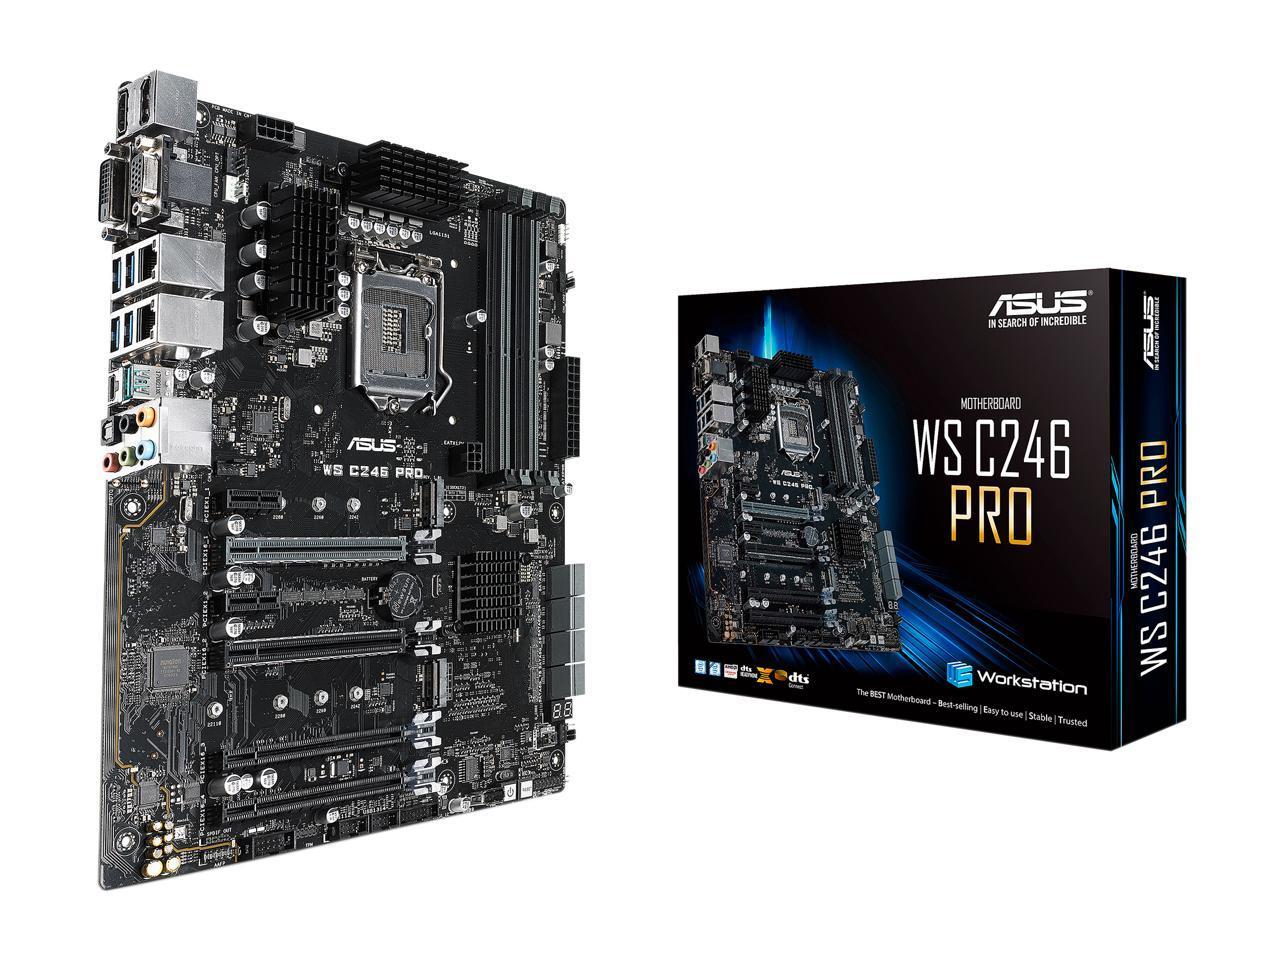 Placa-Mãe Asus WS C246 PRO Intel LGA 1151 ATX DDR4